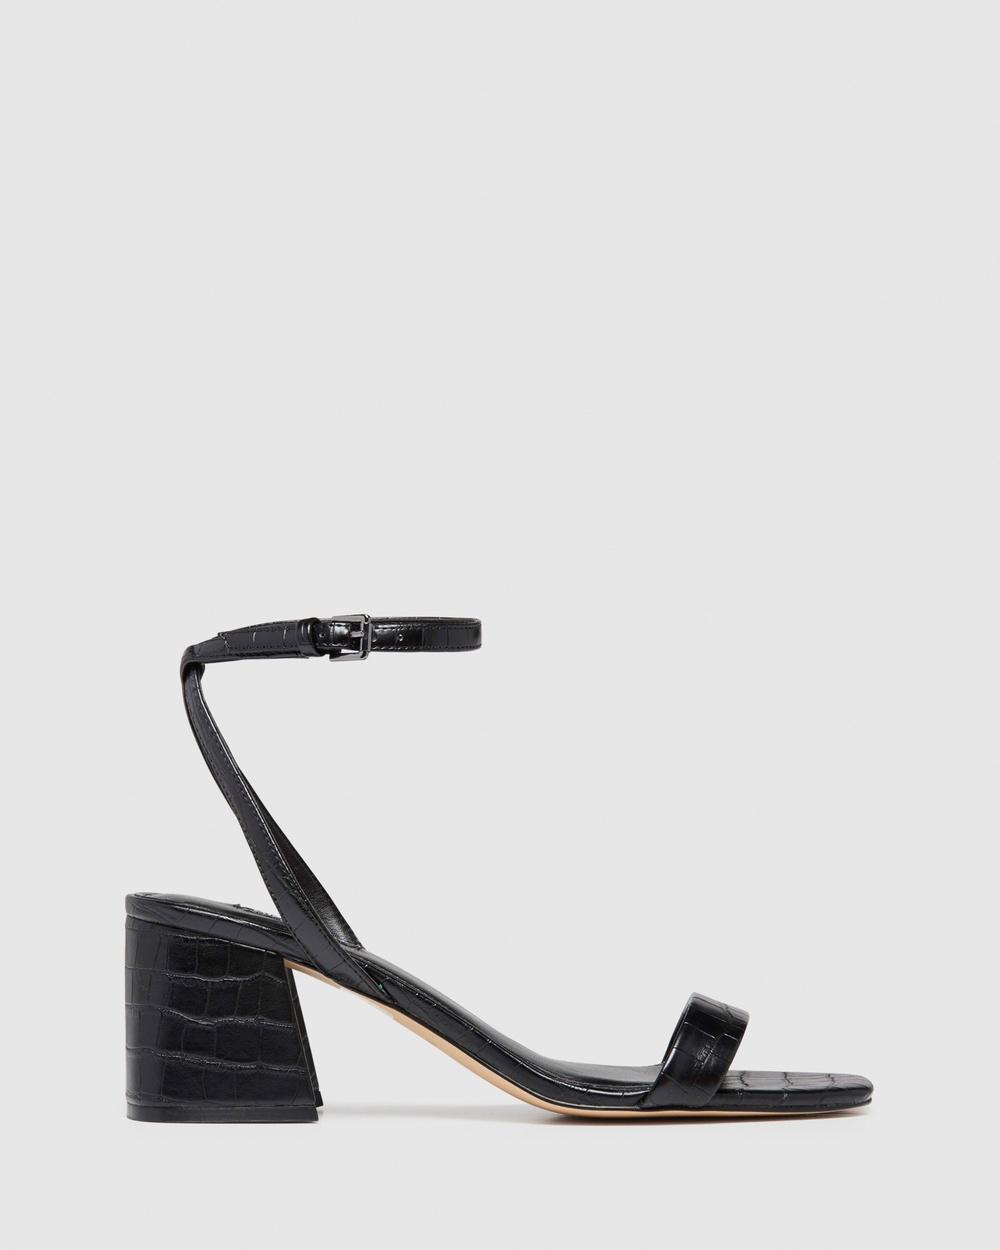 Nine West Giada Sandals BLACK CROC Australia